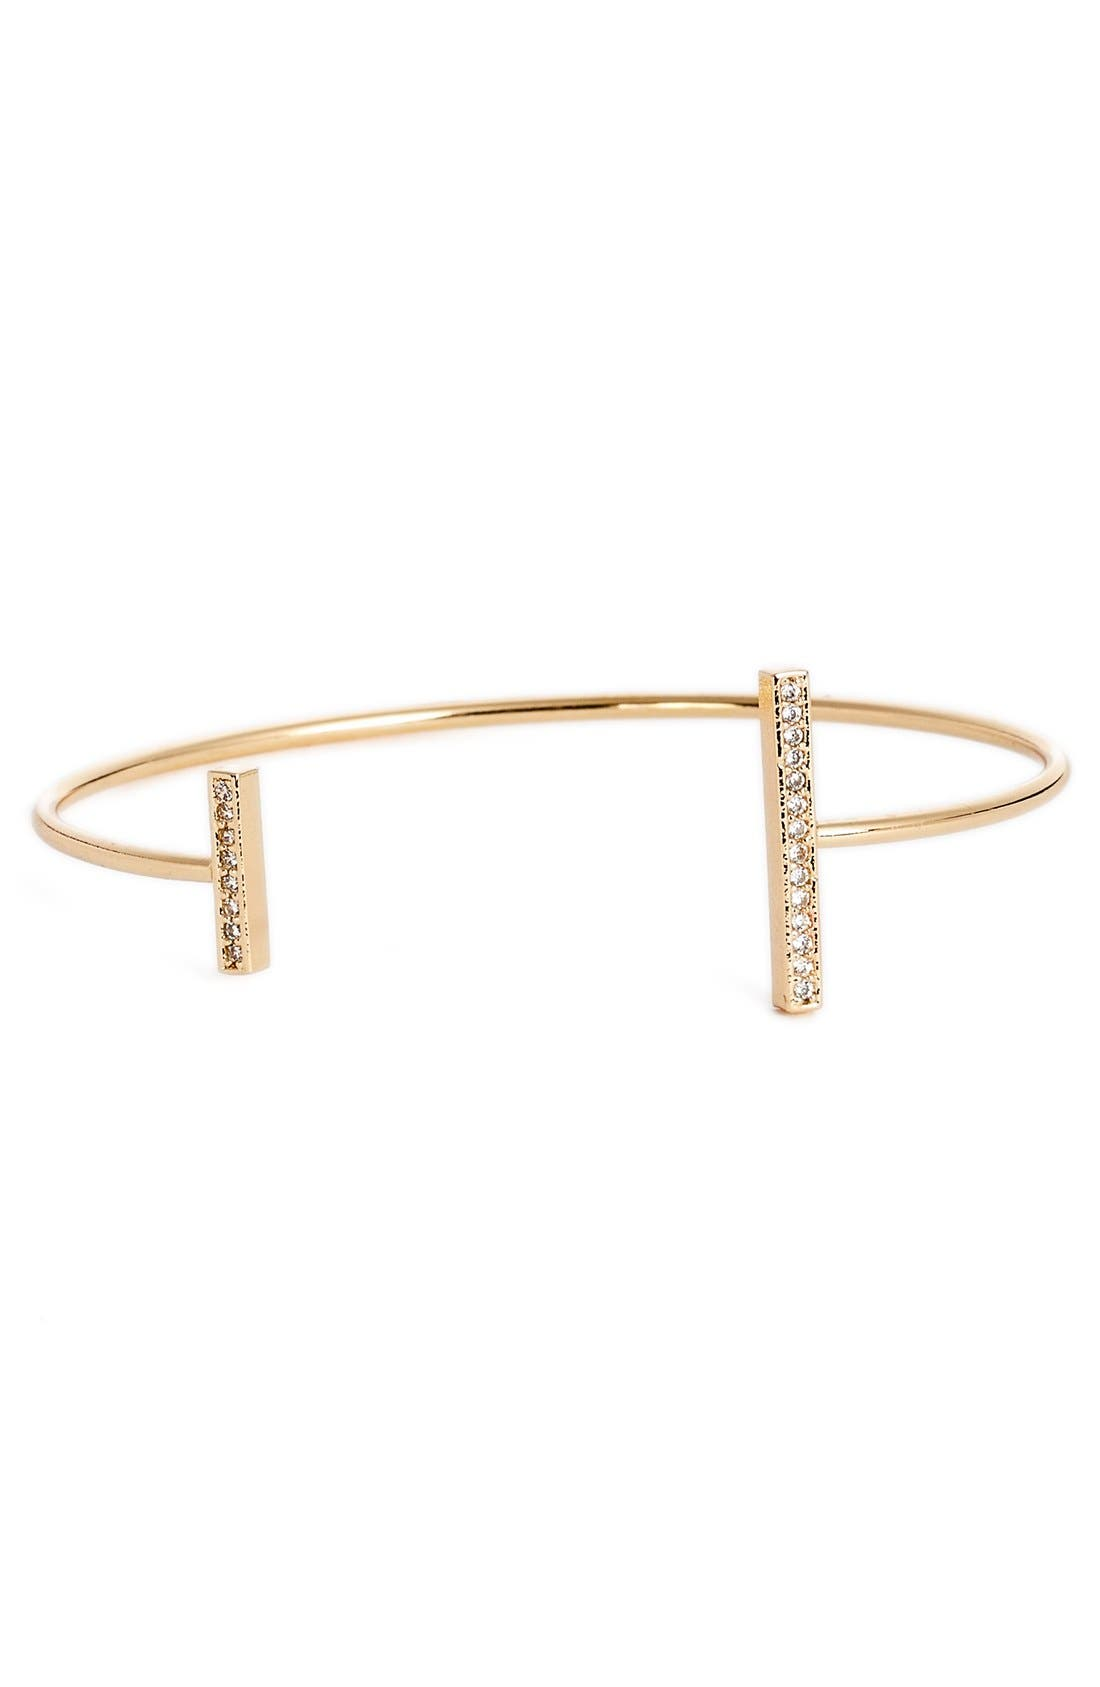 Alternate Image 1 Selected - BP. Stone Bar Cuff Bracelet